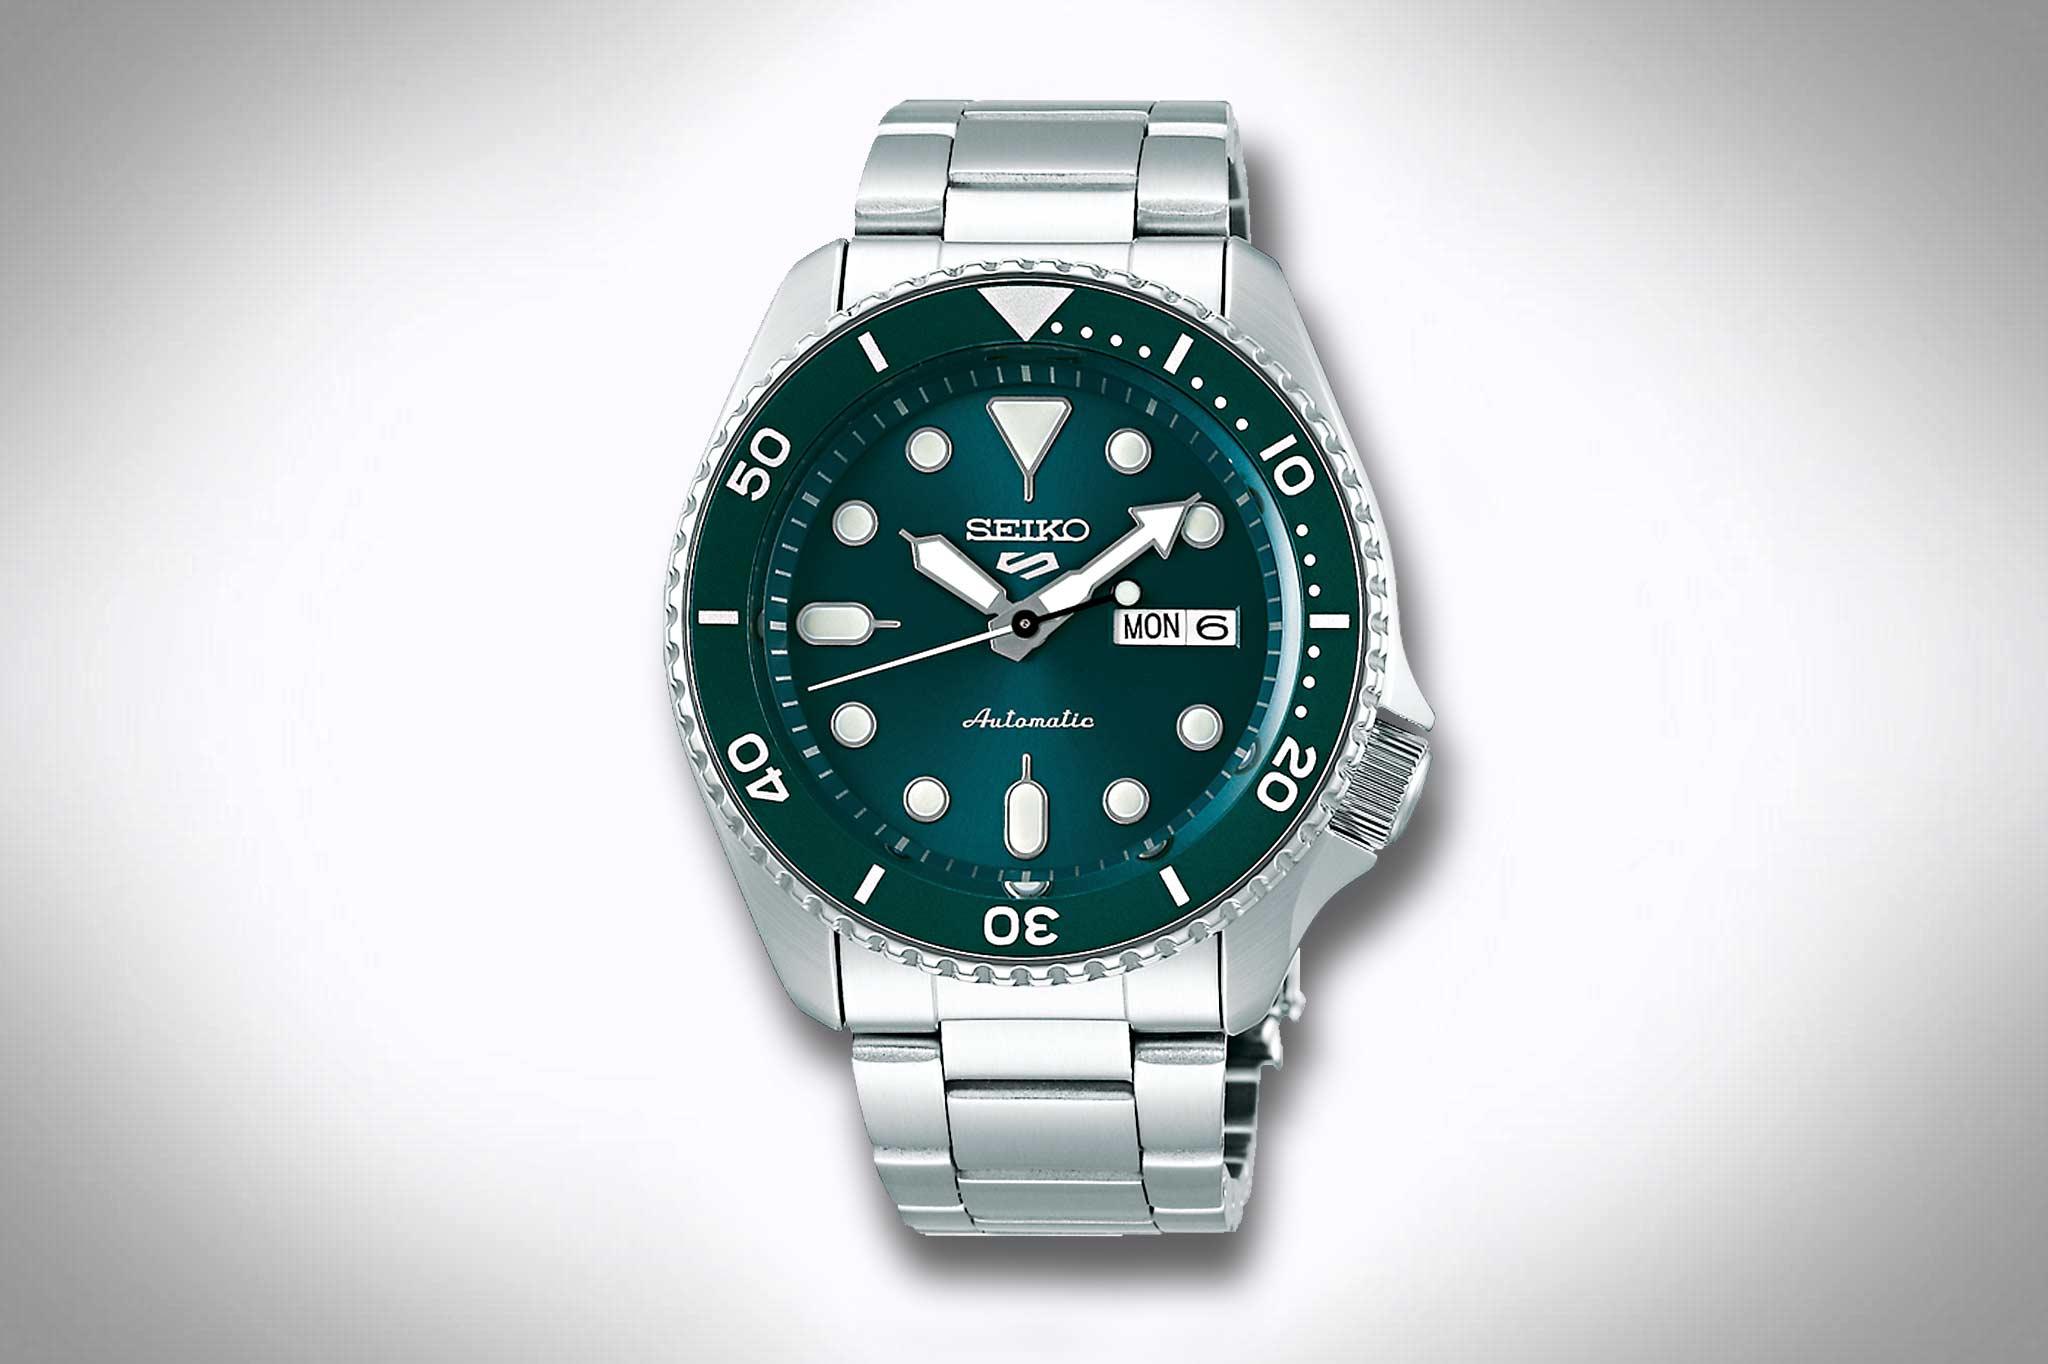 Uhren mit grünem Zifferblatt – Seiko 5 Sports Style SRPD61K1